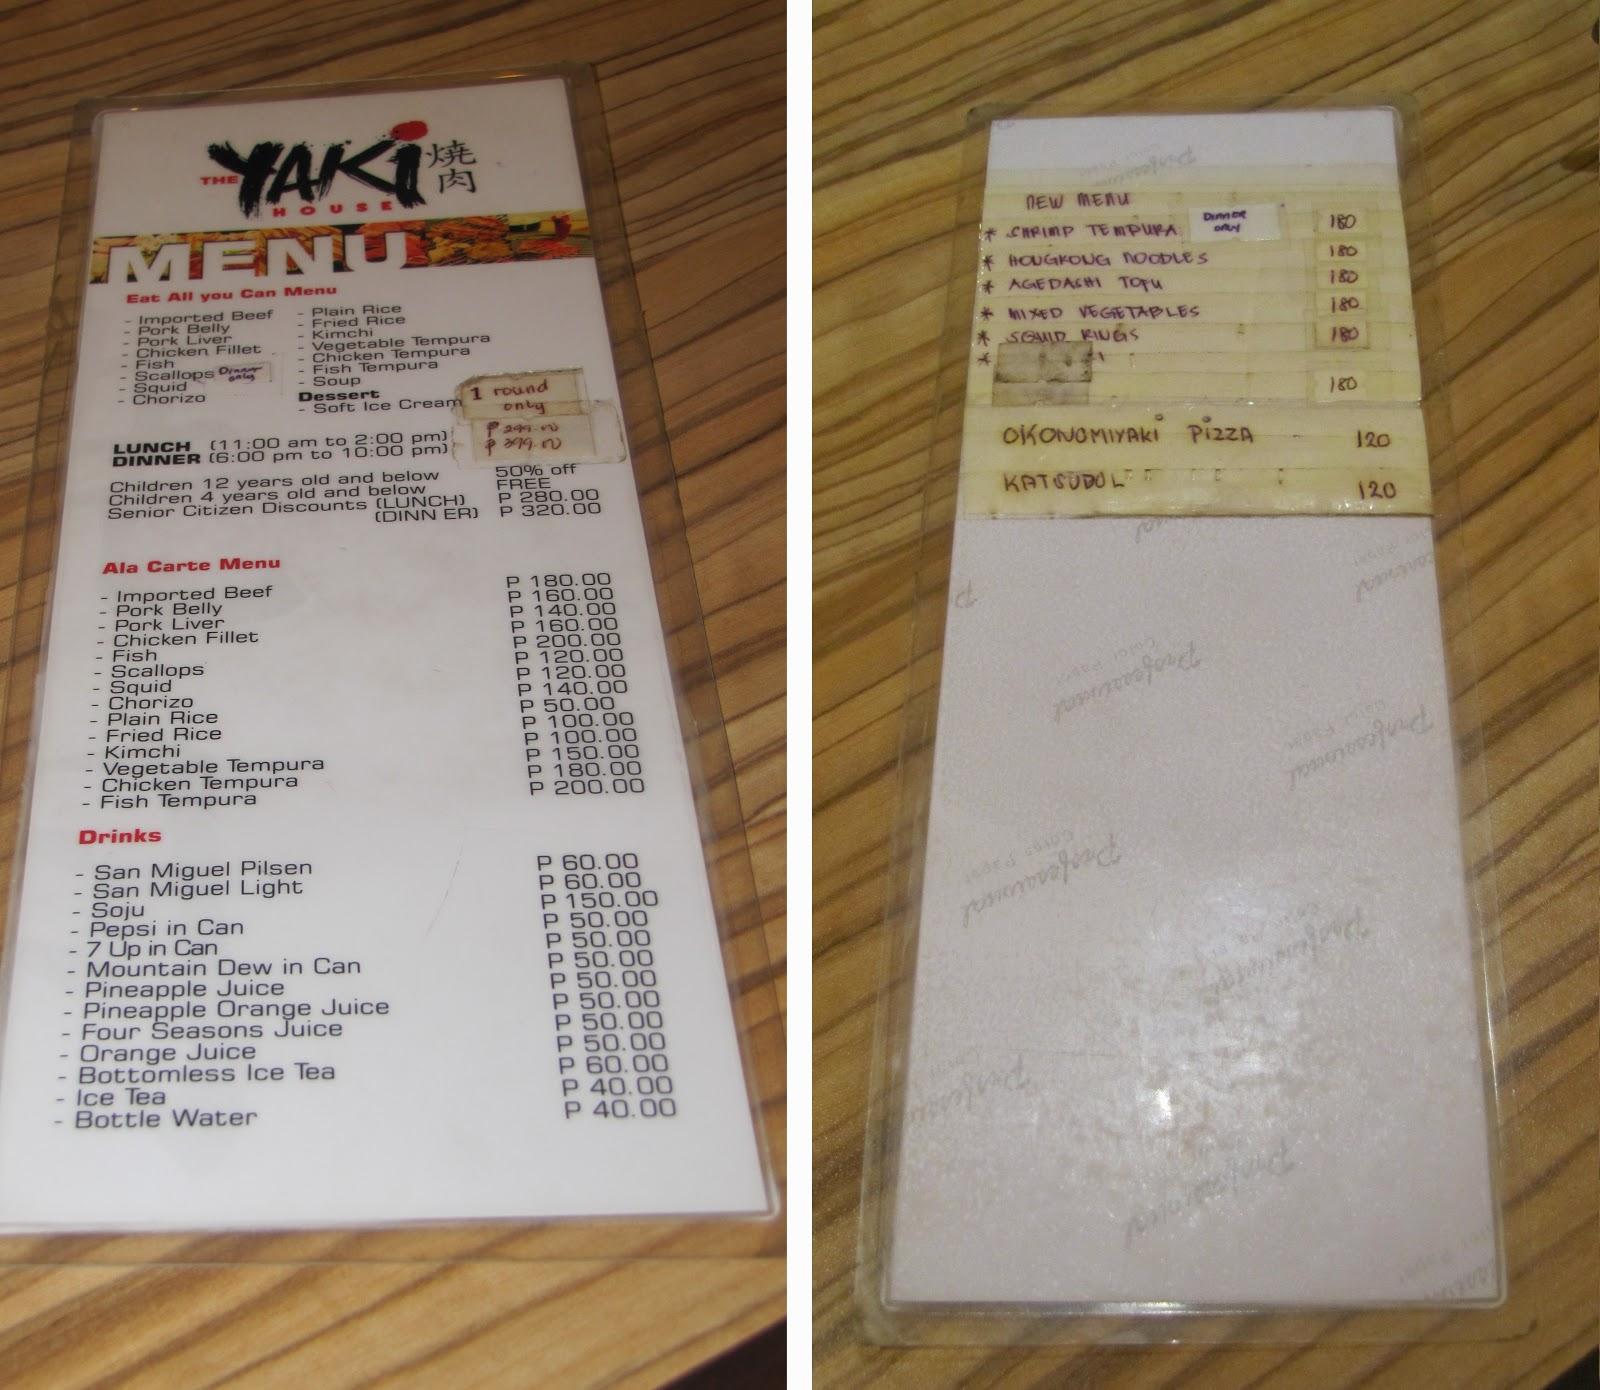 #032eatdrink, food, cebu, japanese food, japanese cuisine, japanese buffet, yakiniku, the yaki house menu